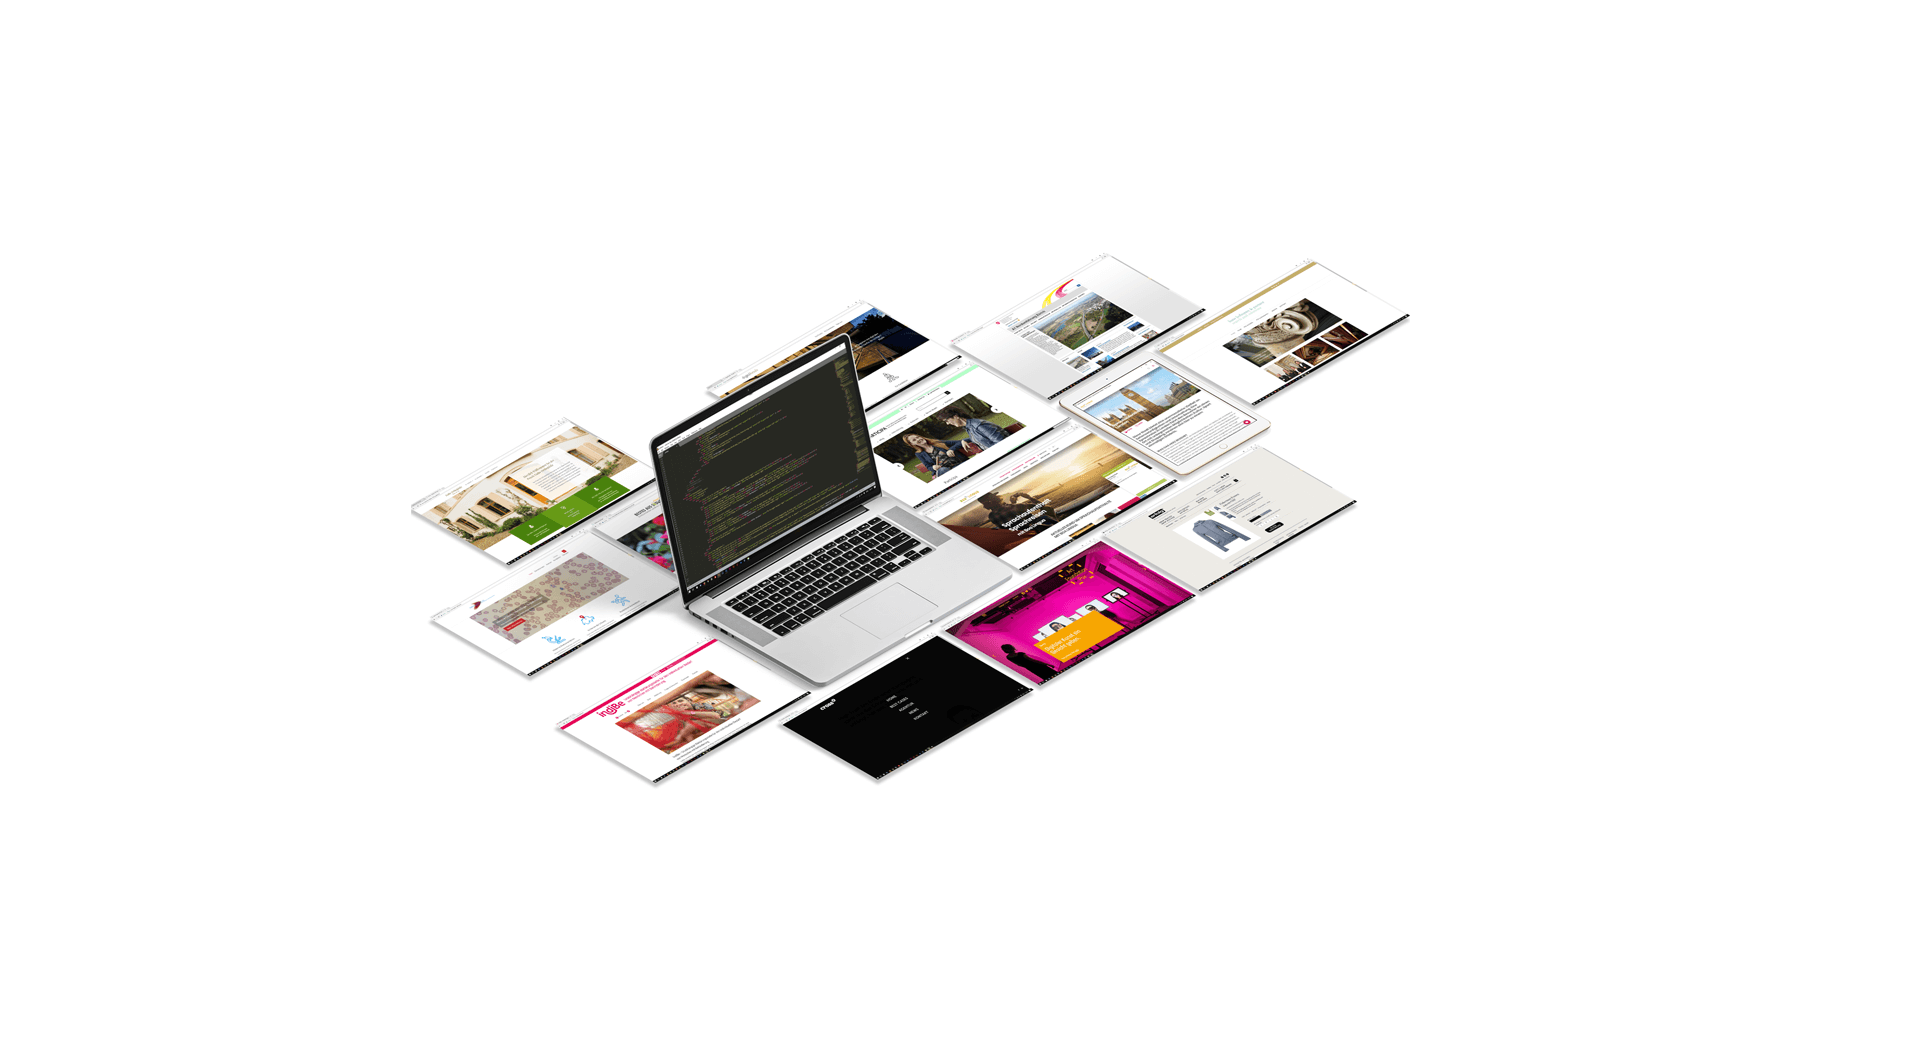 webentwicklung cms projekte k-webs